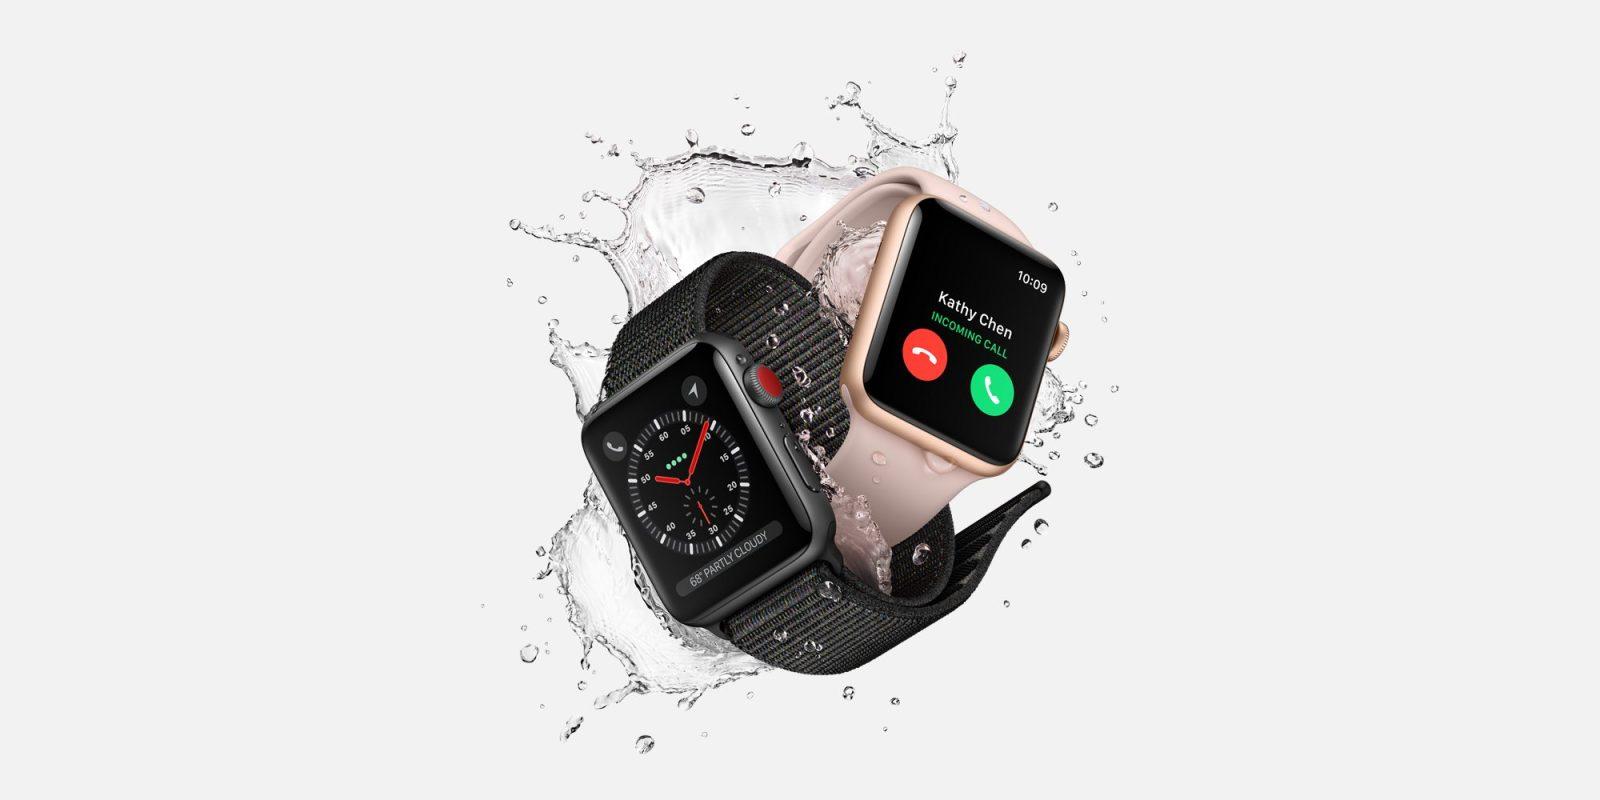 Apple Watch Series 3 - 9to5Mac